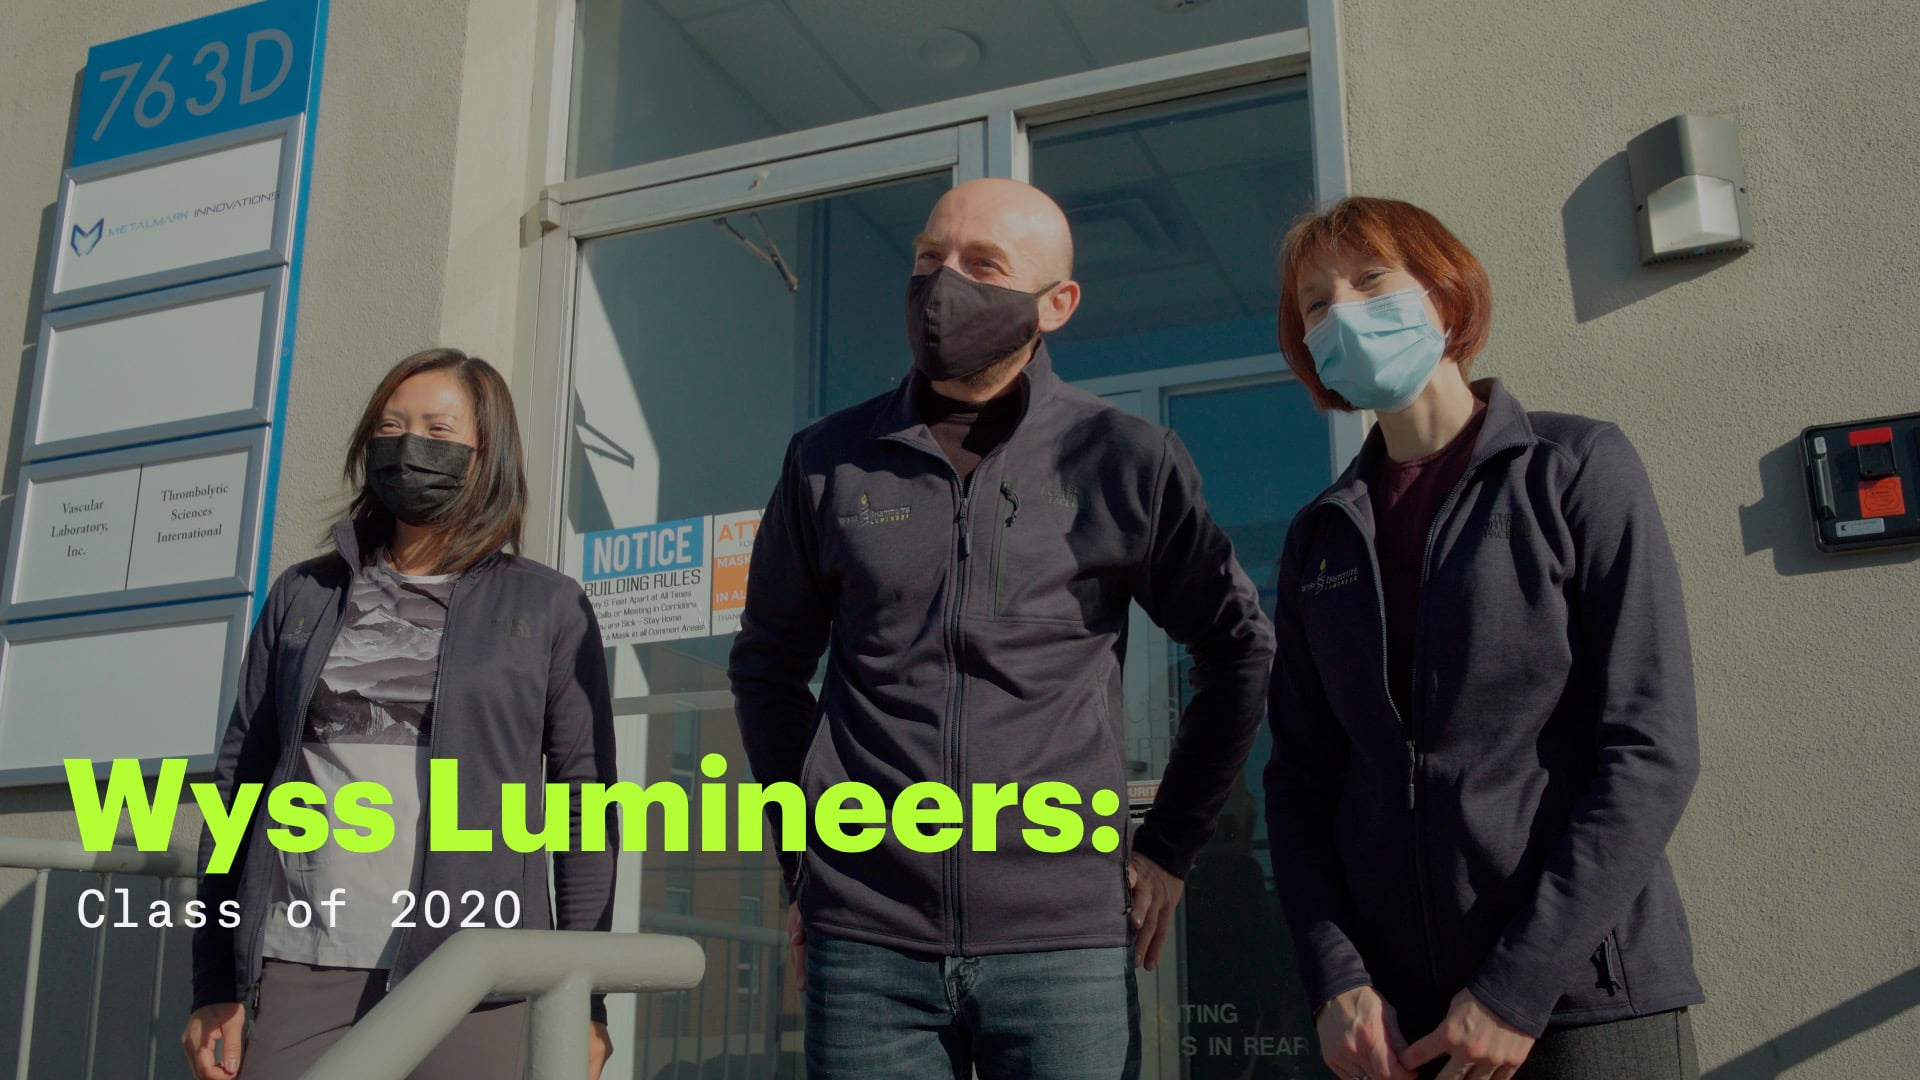 Wyss Lumineers: Class of 2020